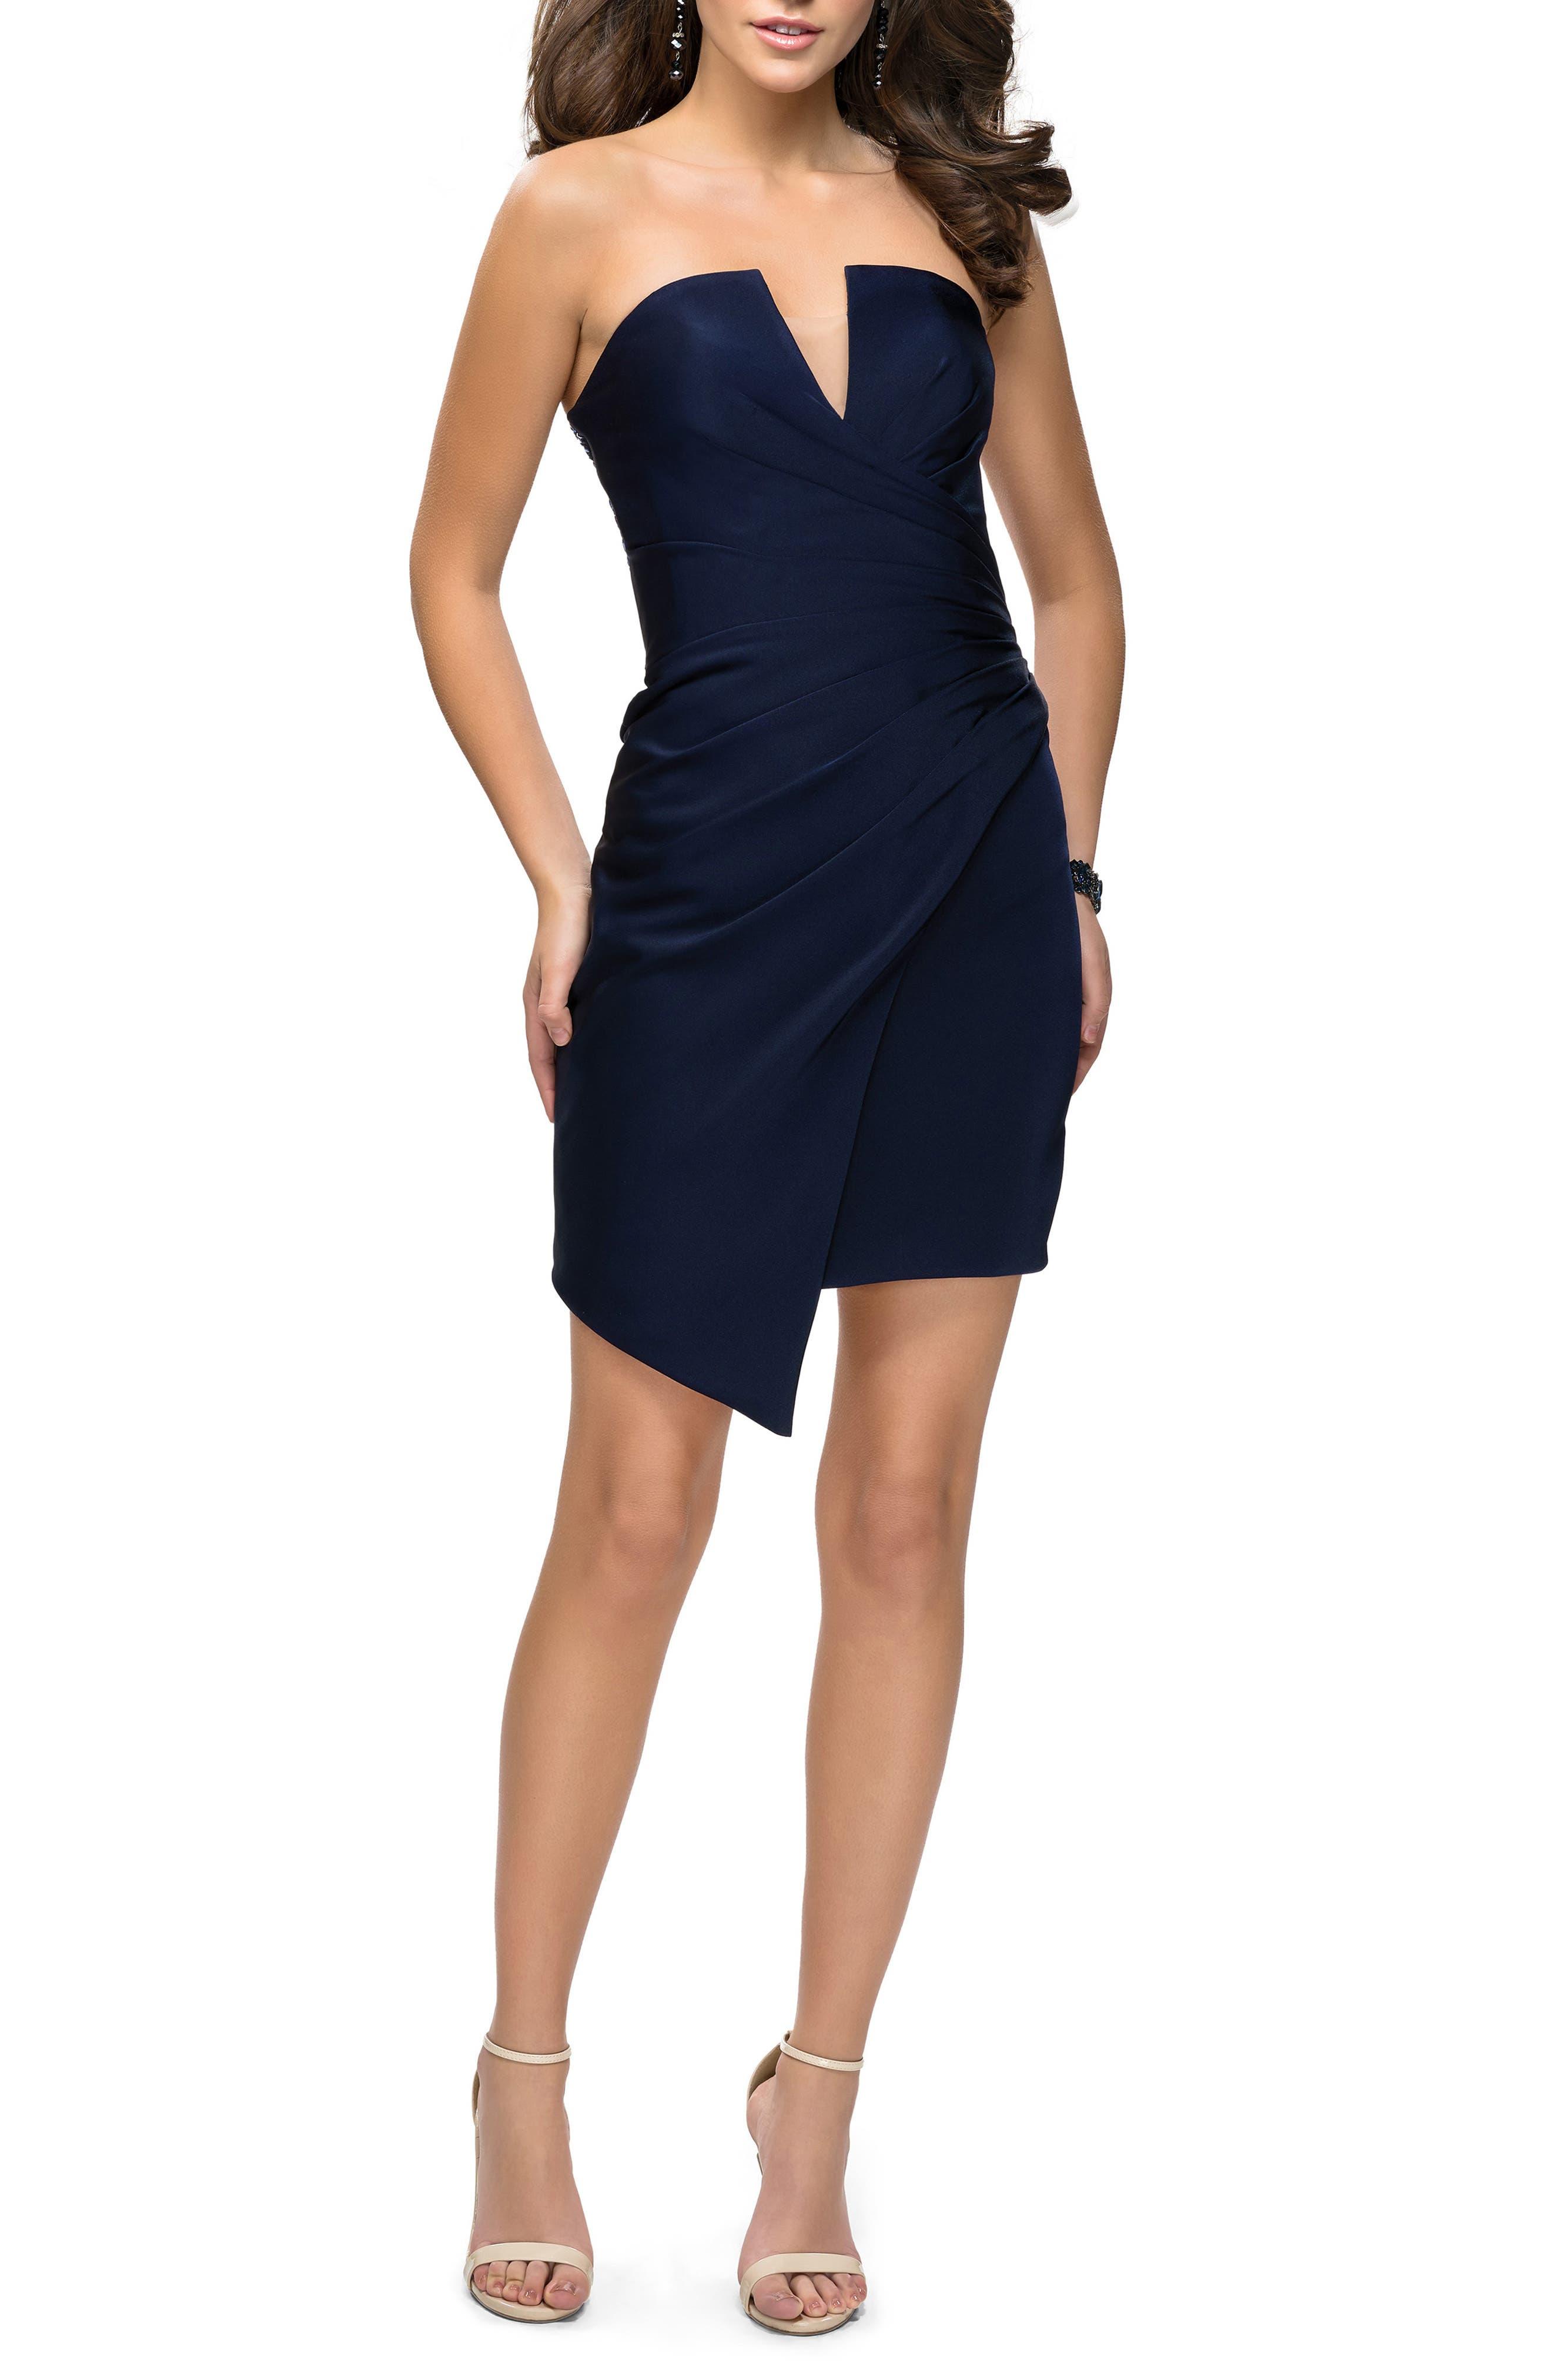 LA FEMME Strapless Asymmetrical Party Dress in Navy